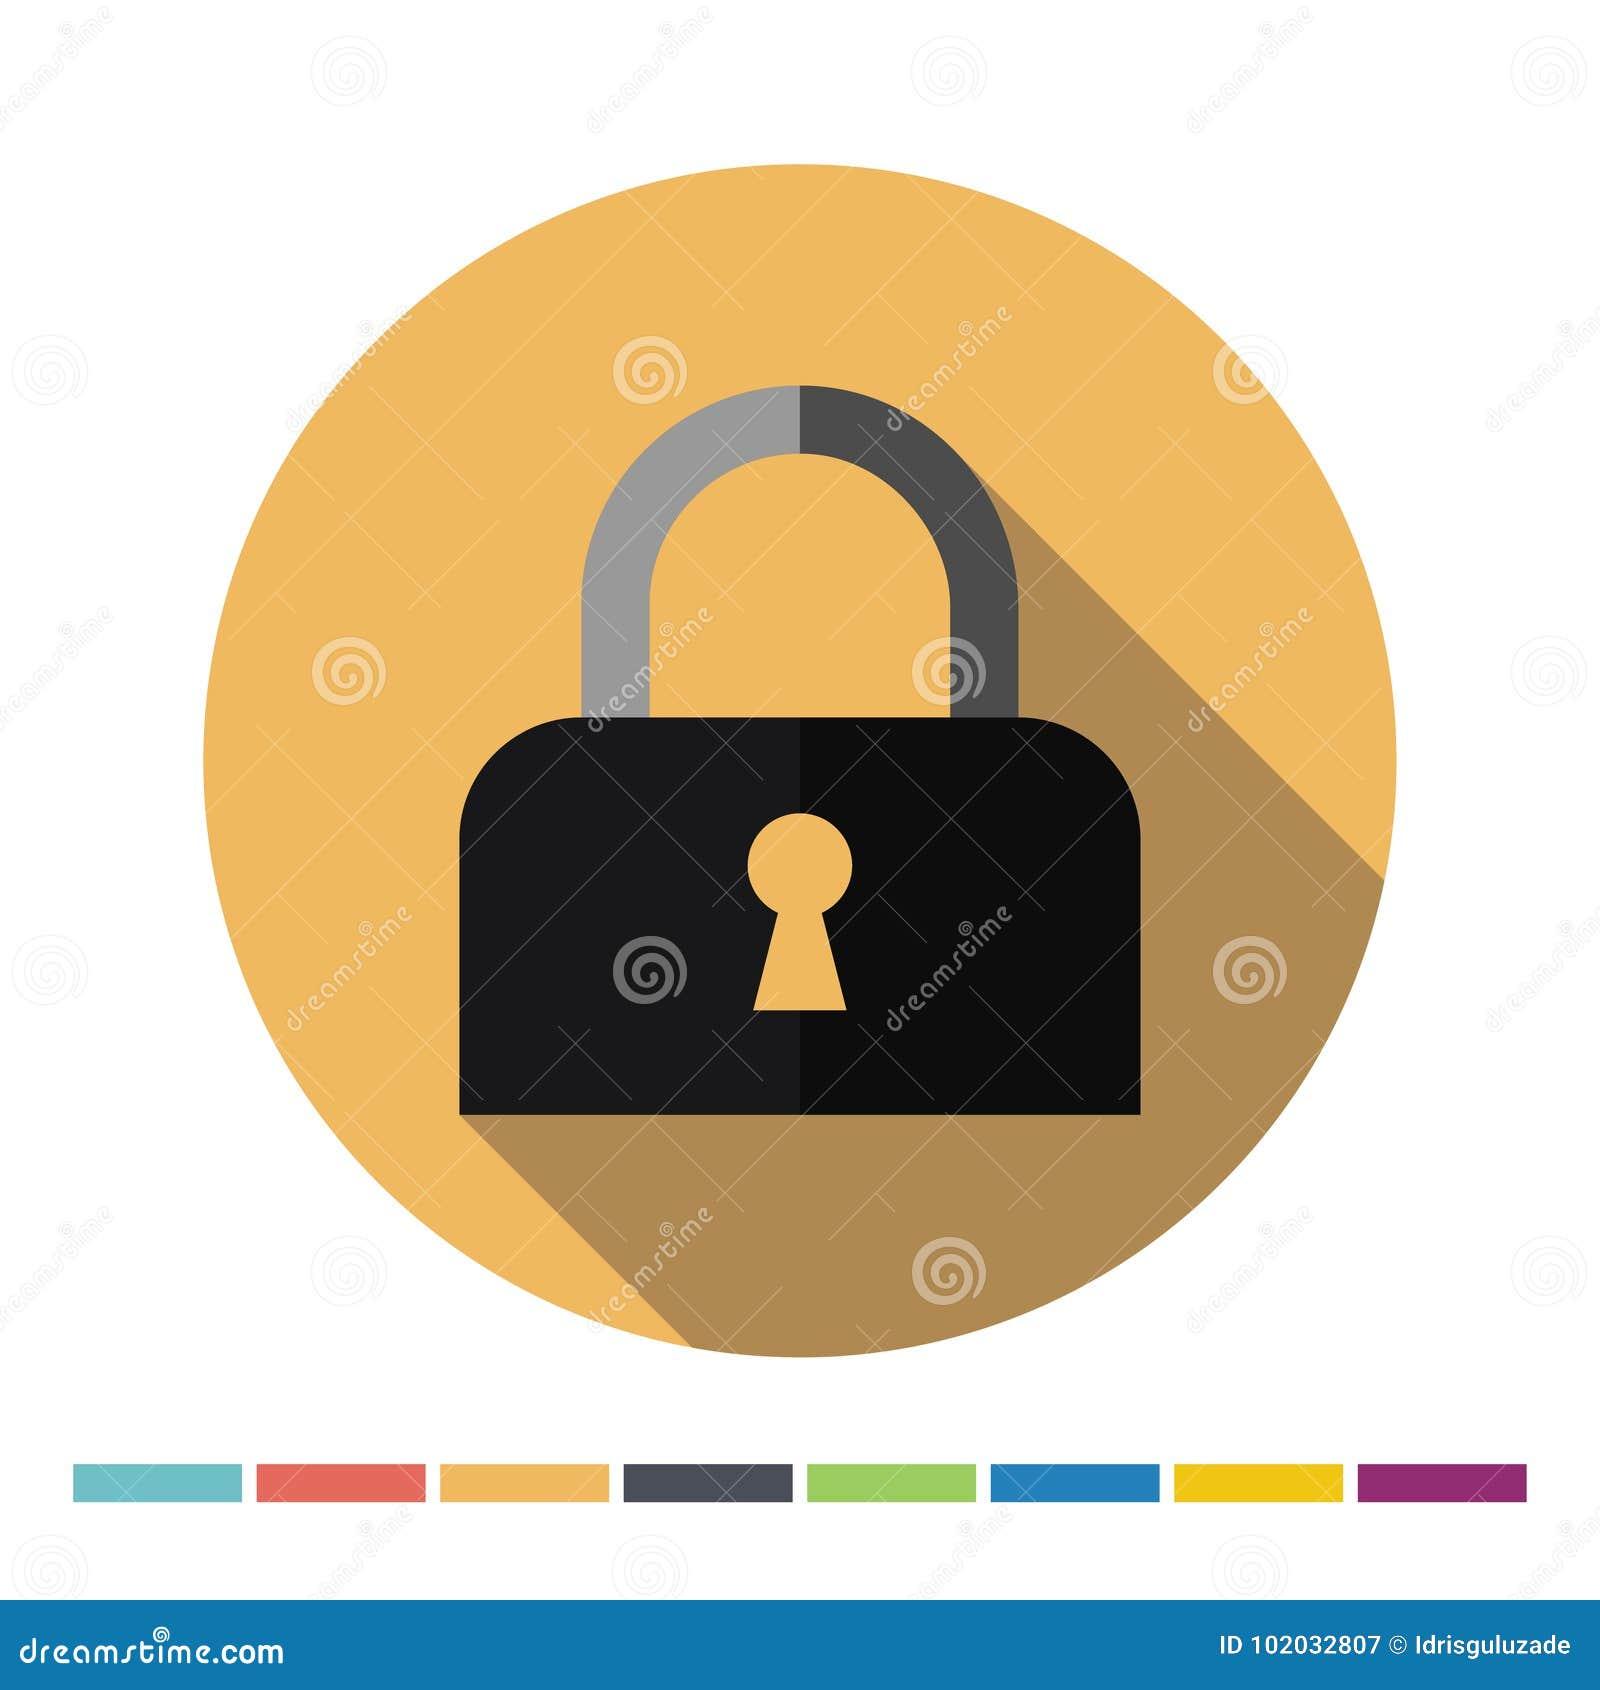 Locked padlock icon